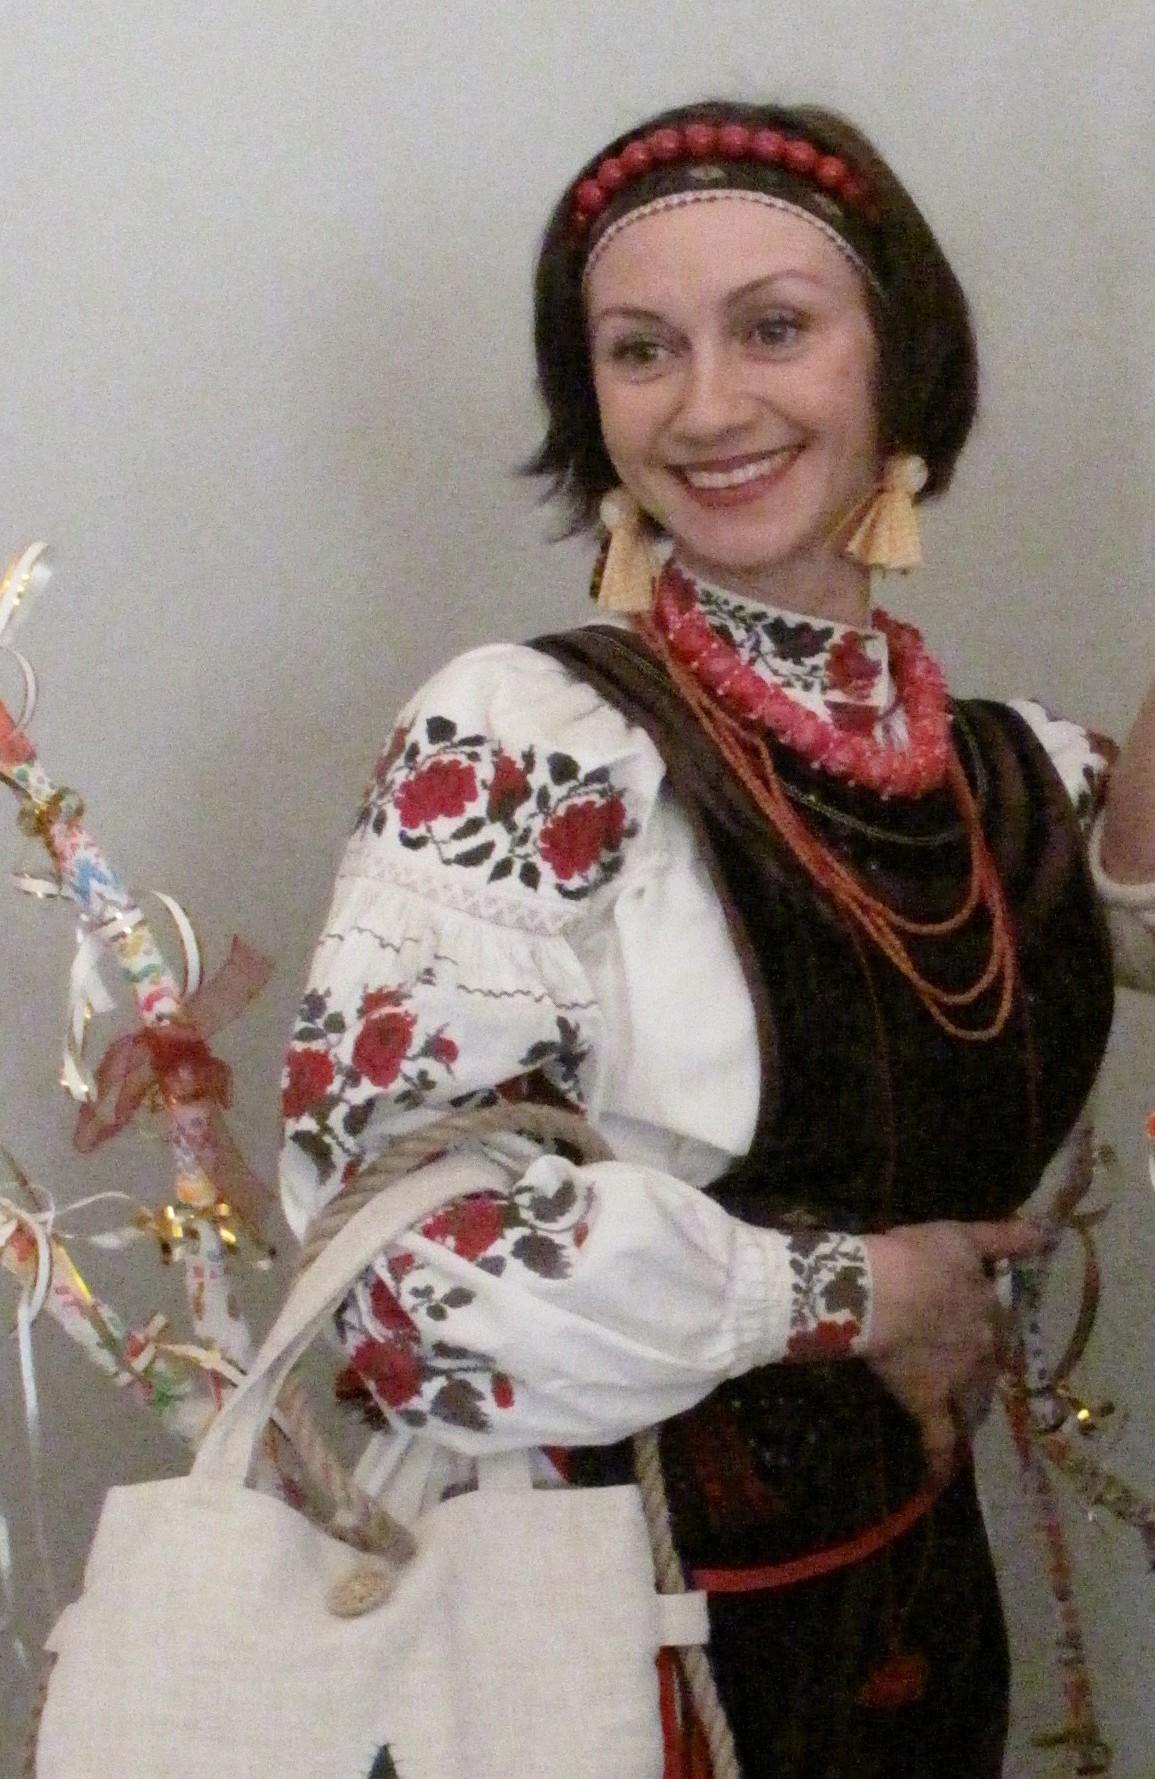 Акторка Молодого театру Римма Зюбіна. Фото: Оксана Позднякова/The Epoch Times Україна